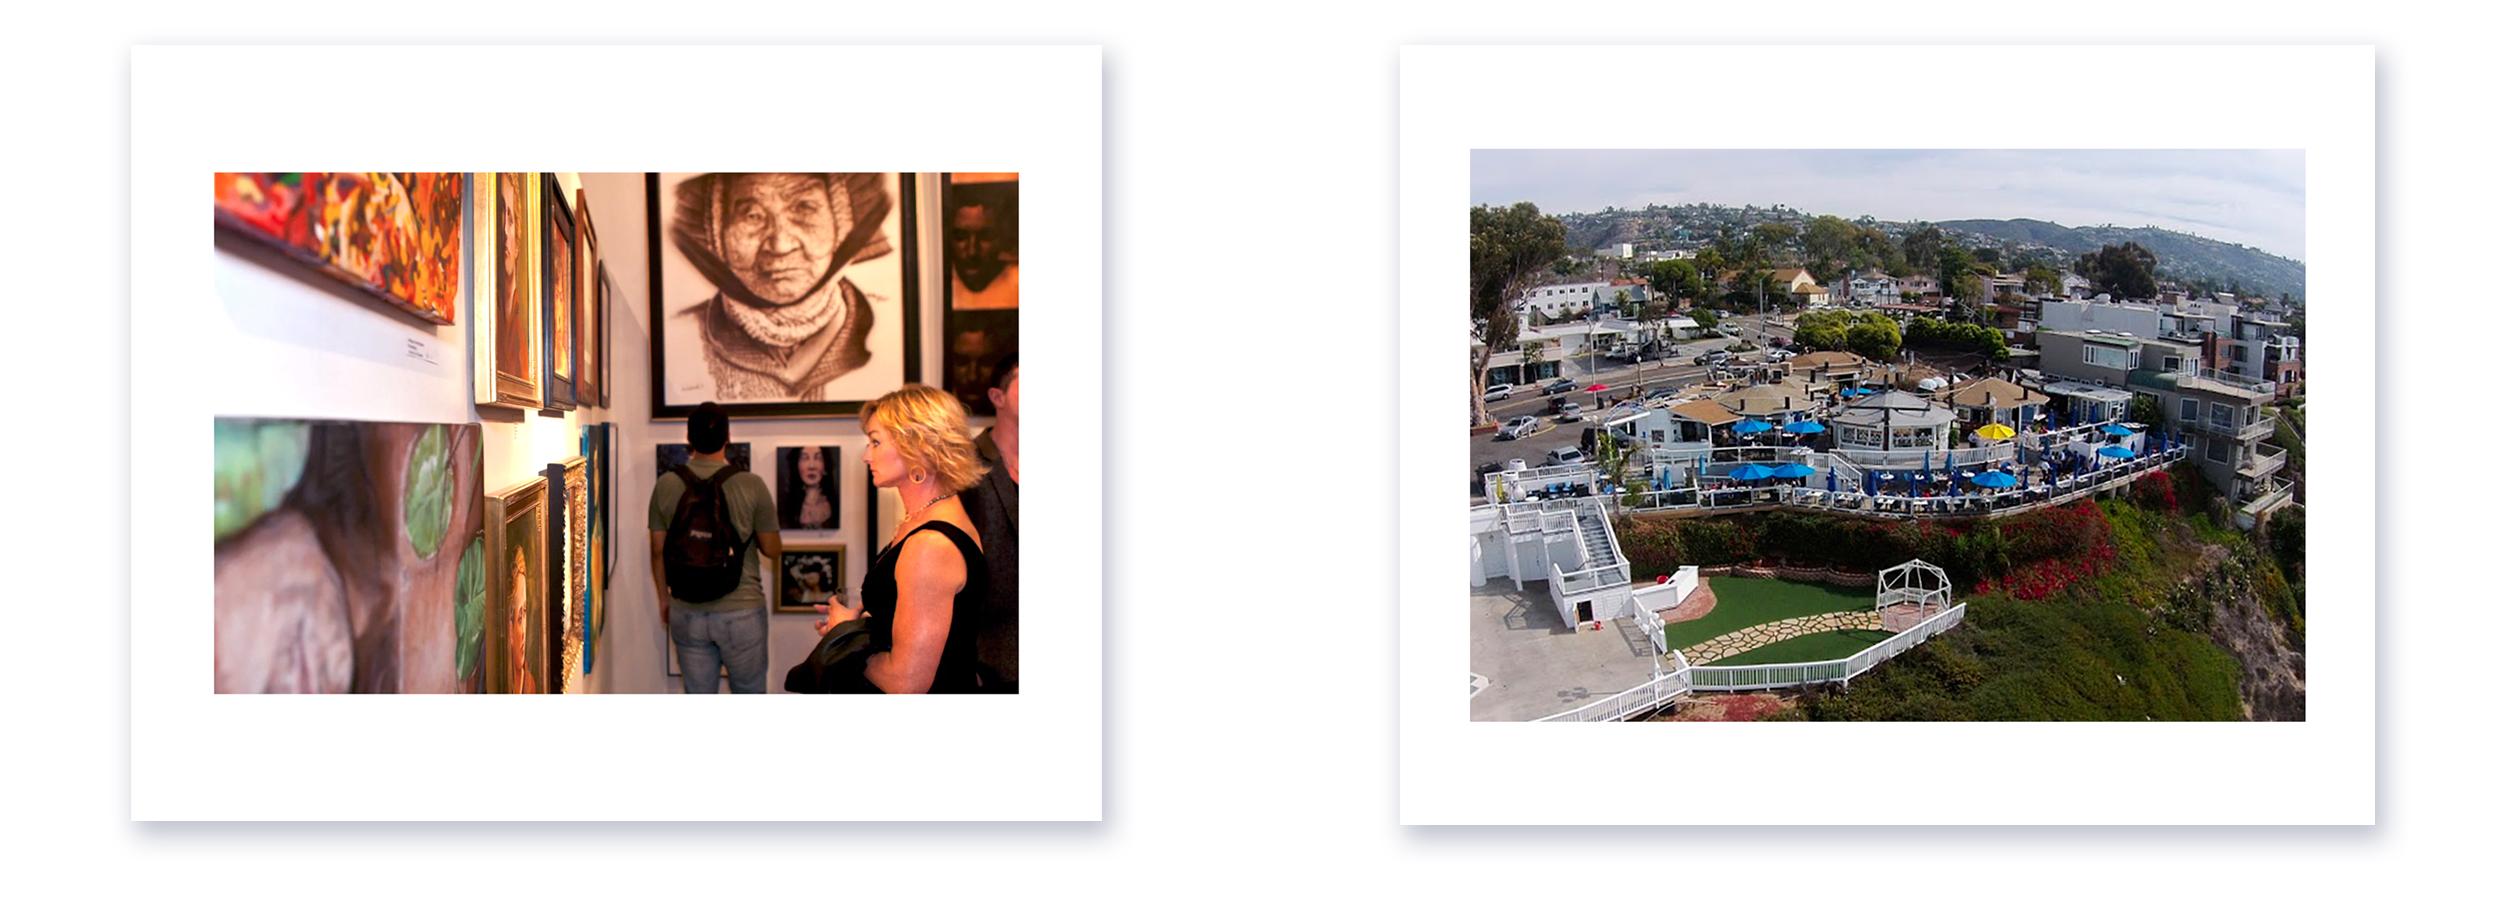 Las Laguna Art Gallery, The 2nd Half (50 and Older) 2021, Los Angeles. Landscape of Art Gallery